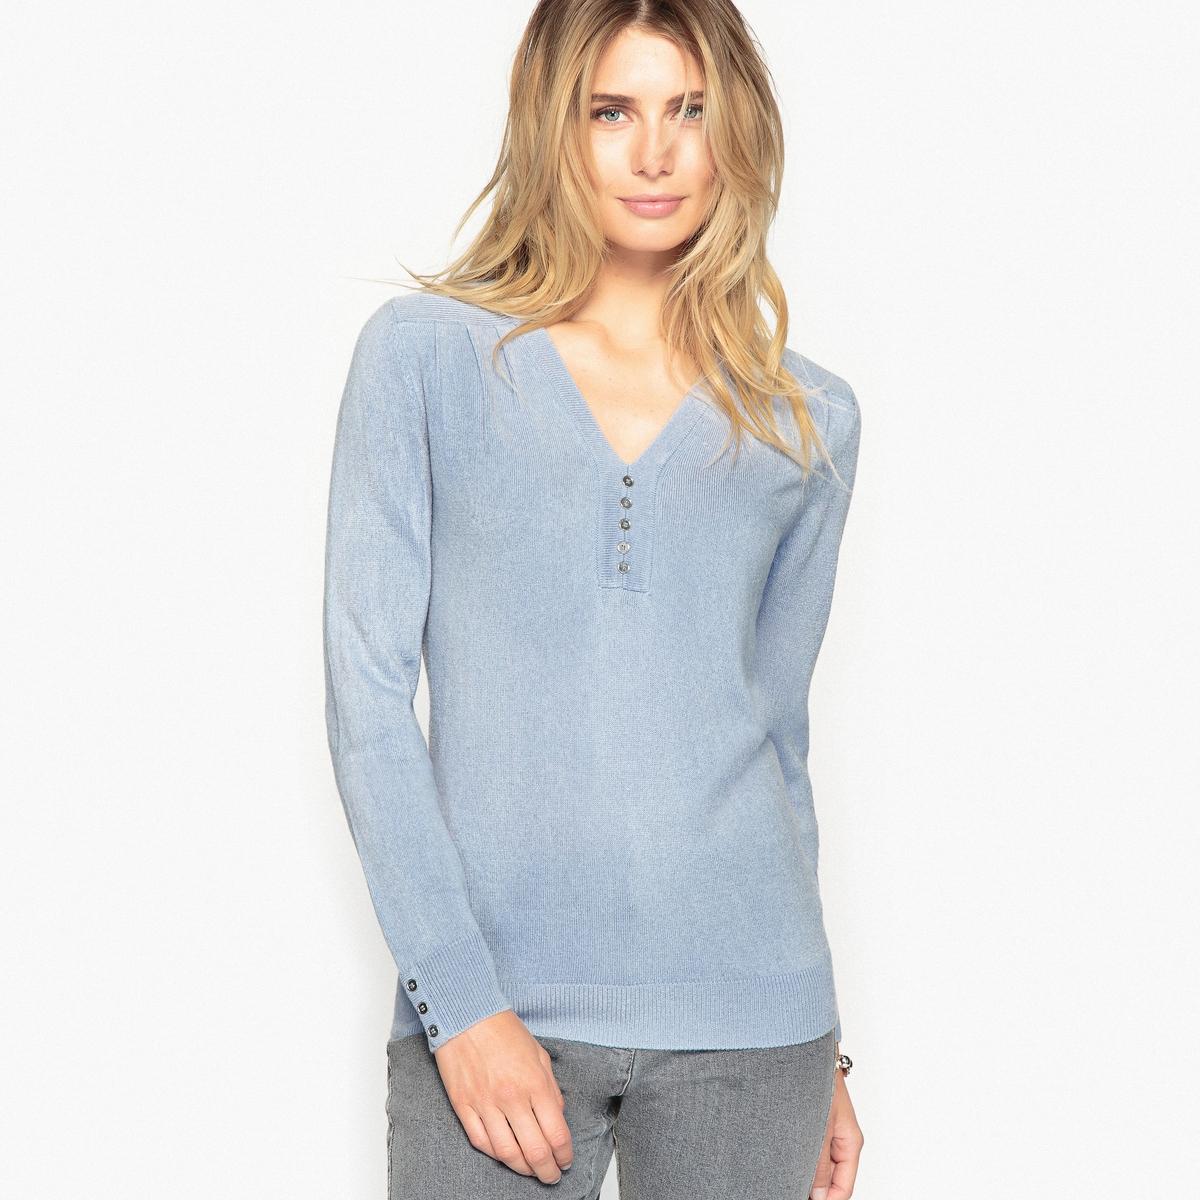 Пуловер мягкий, как кашемир 17 idei kak prevratit svou dachy v nastoiashii raiskii ygolok